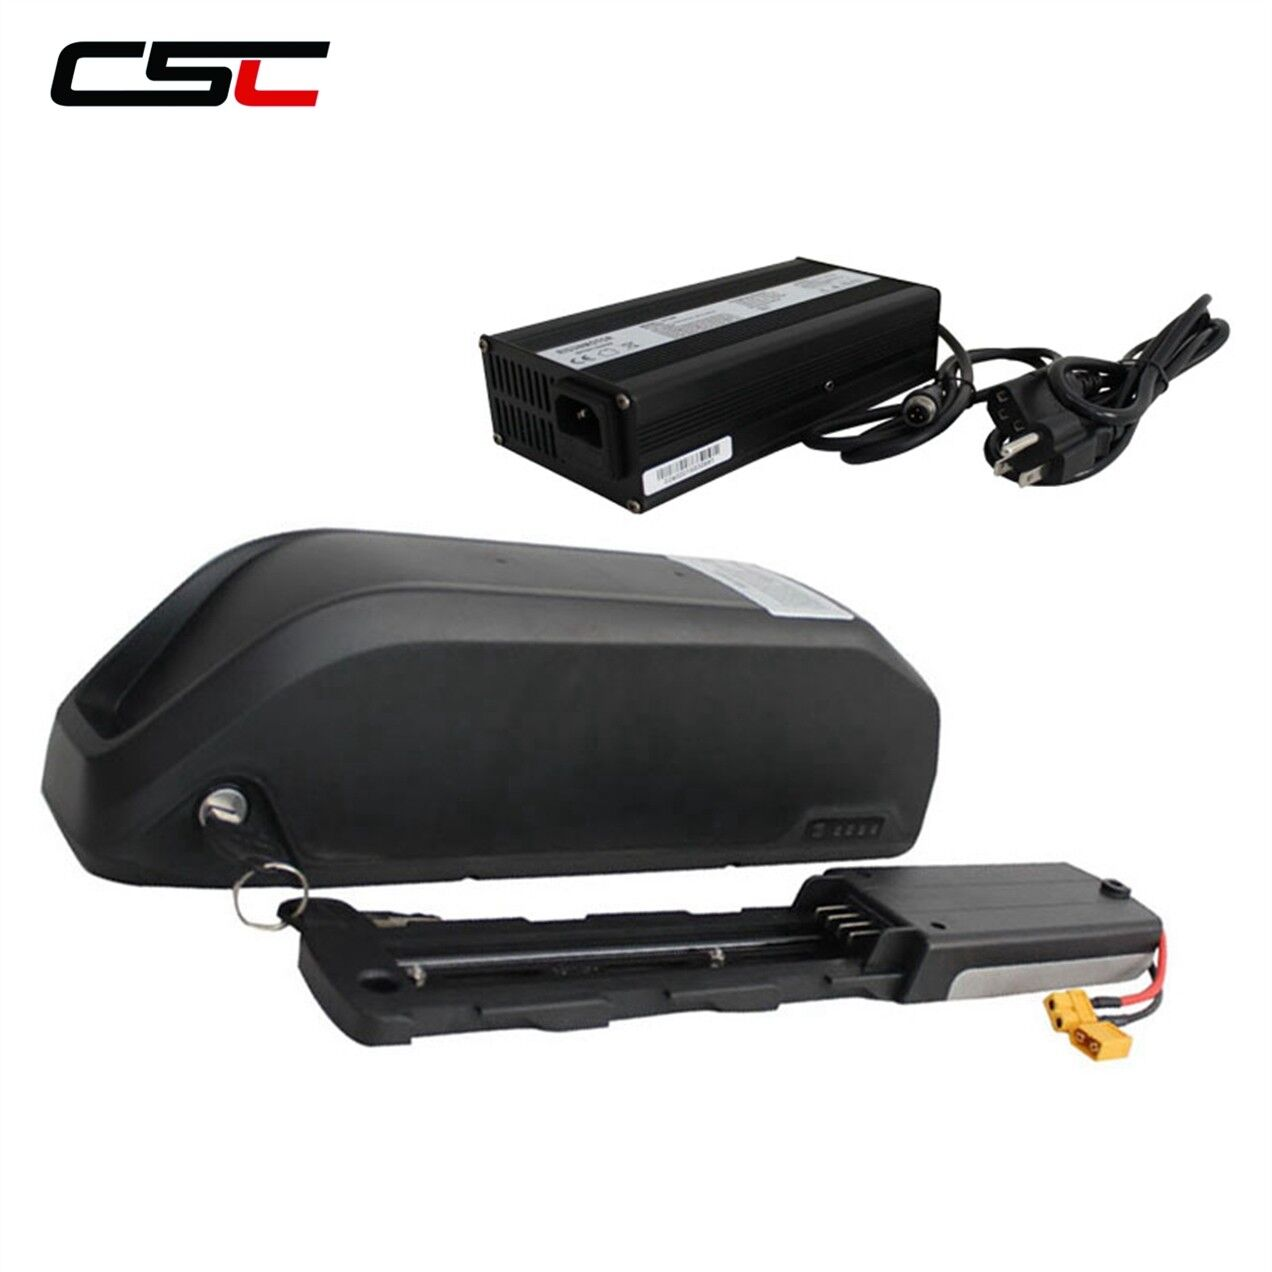 E-bike Li Battery 52V 17.5AH 1500W Samsung Cell  Electric Bike Battery  on sale 70% off